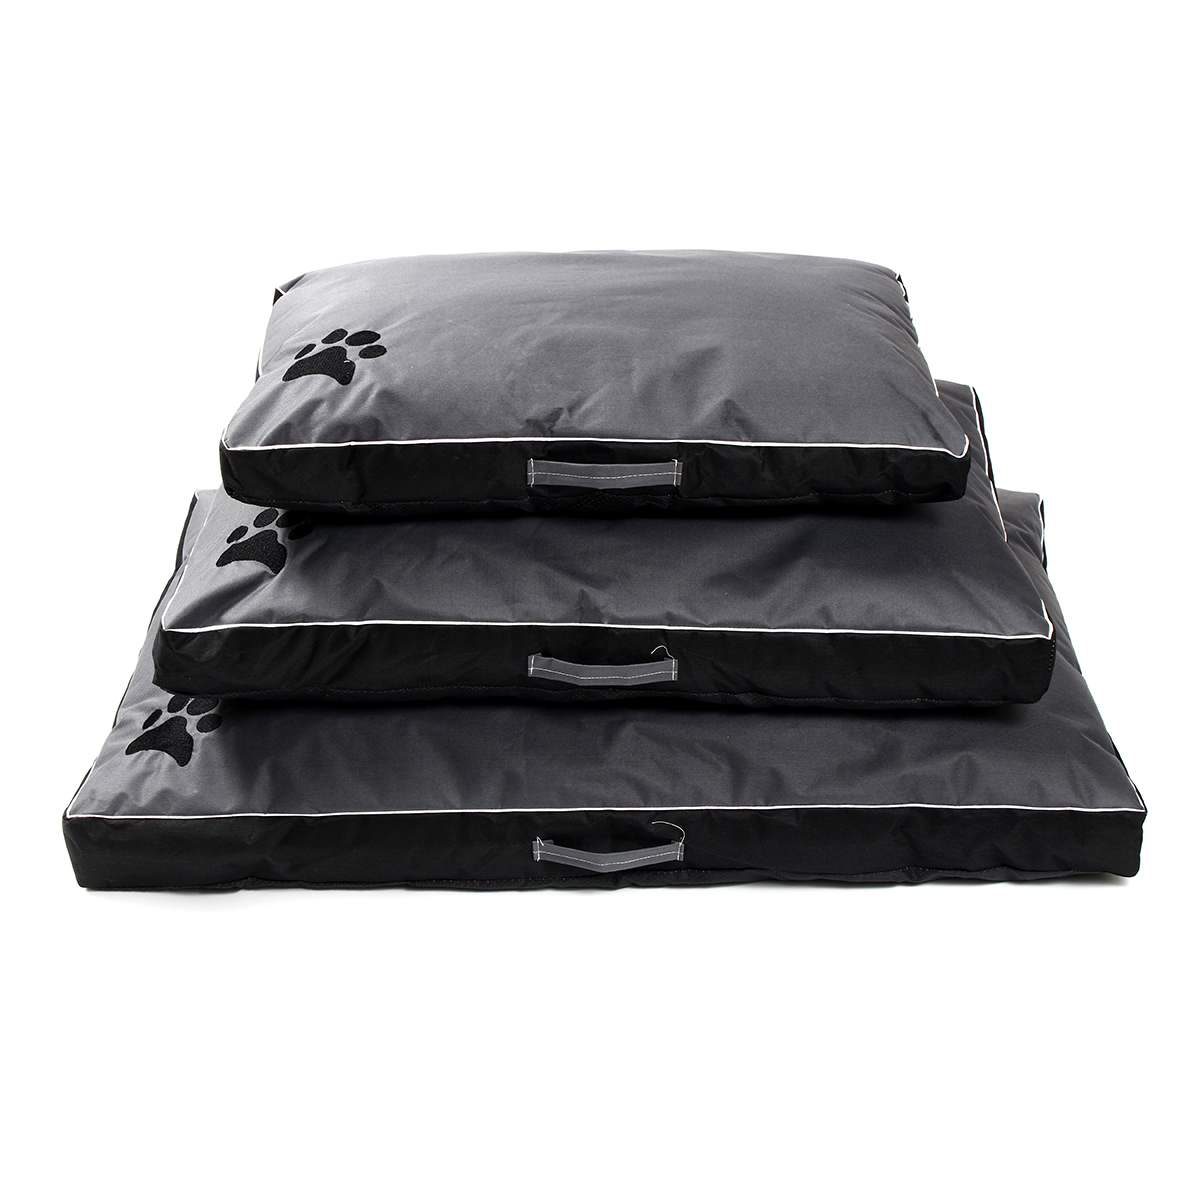 Colchón de cama para mascotas, cojín para perro, gato, almohadilla resistente al agua 3 tamaño